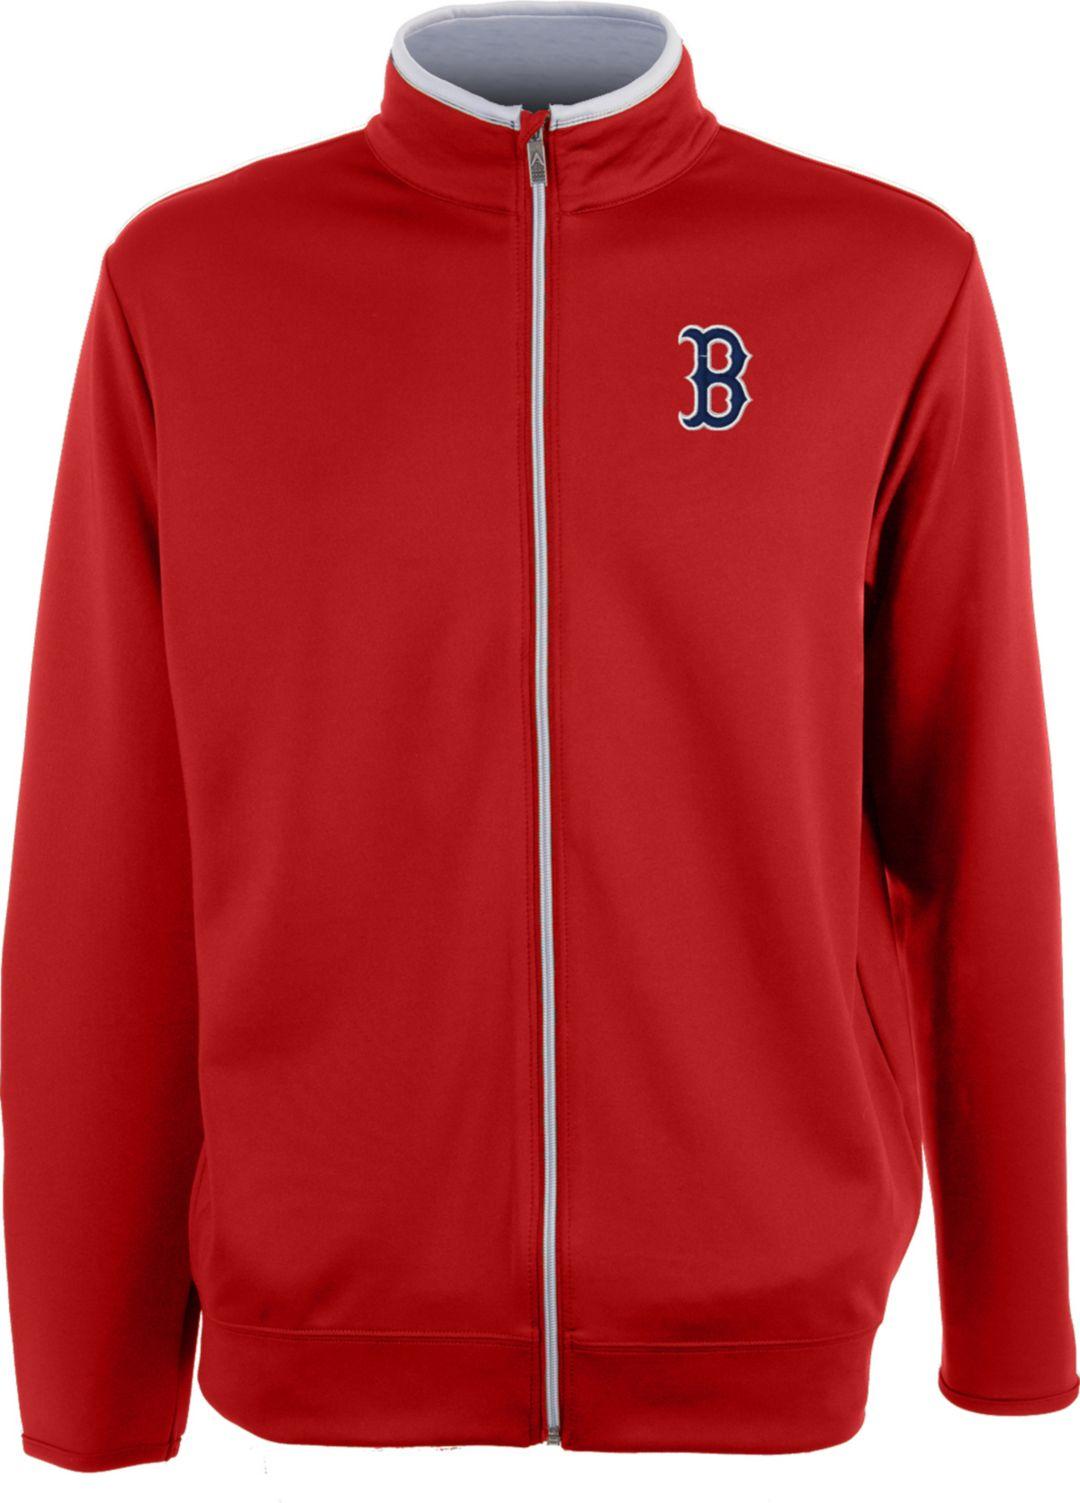 cheap for discount e12e6 09029 Antigua Men's Boston Red Sox Leader Red Full-Zip Jacket